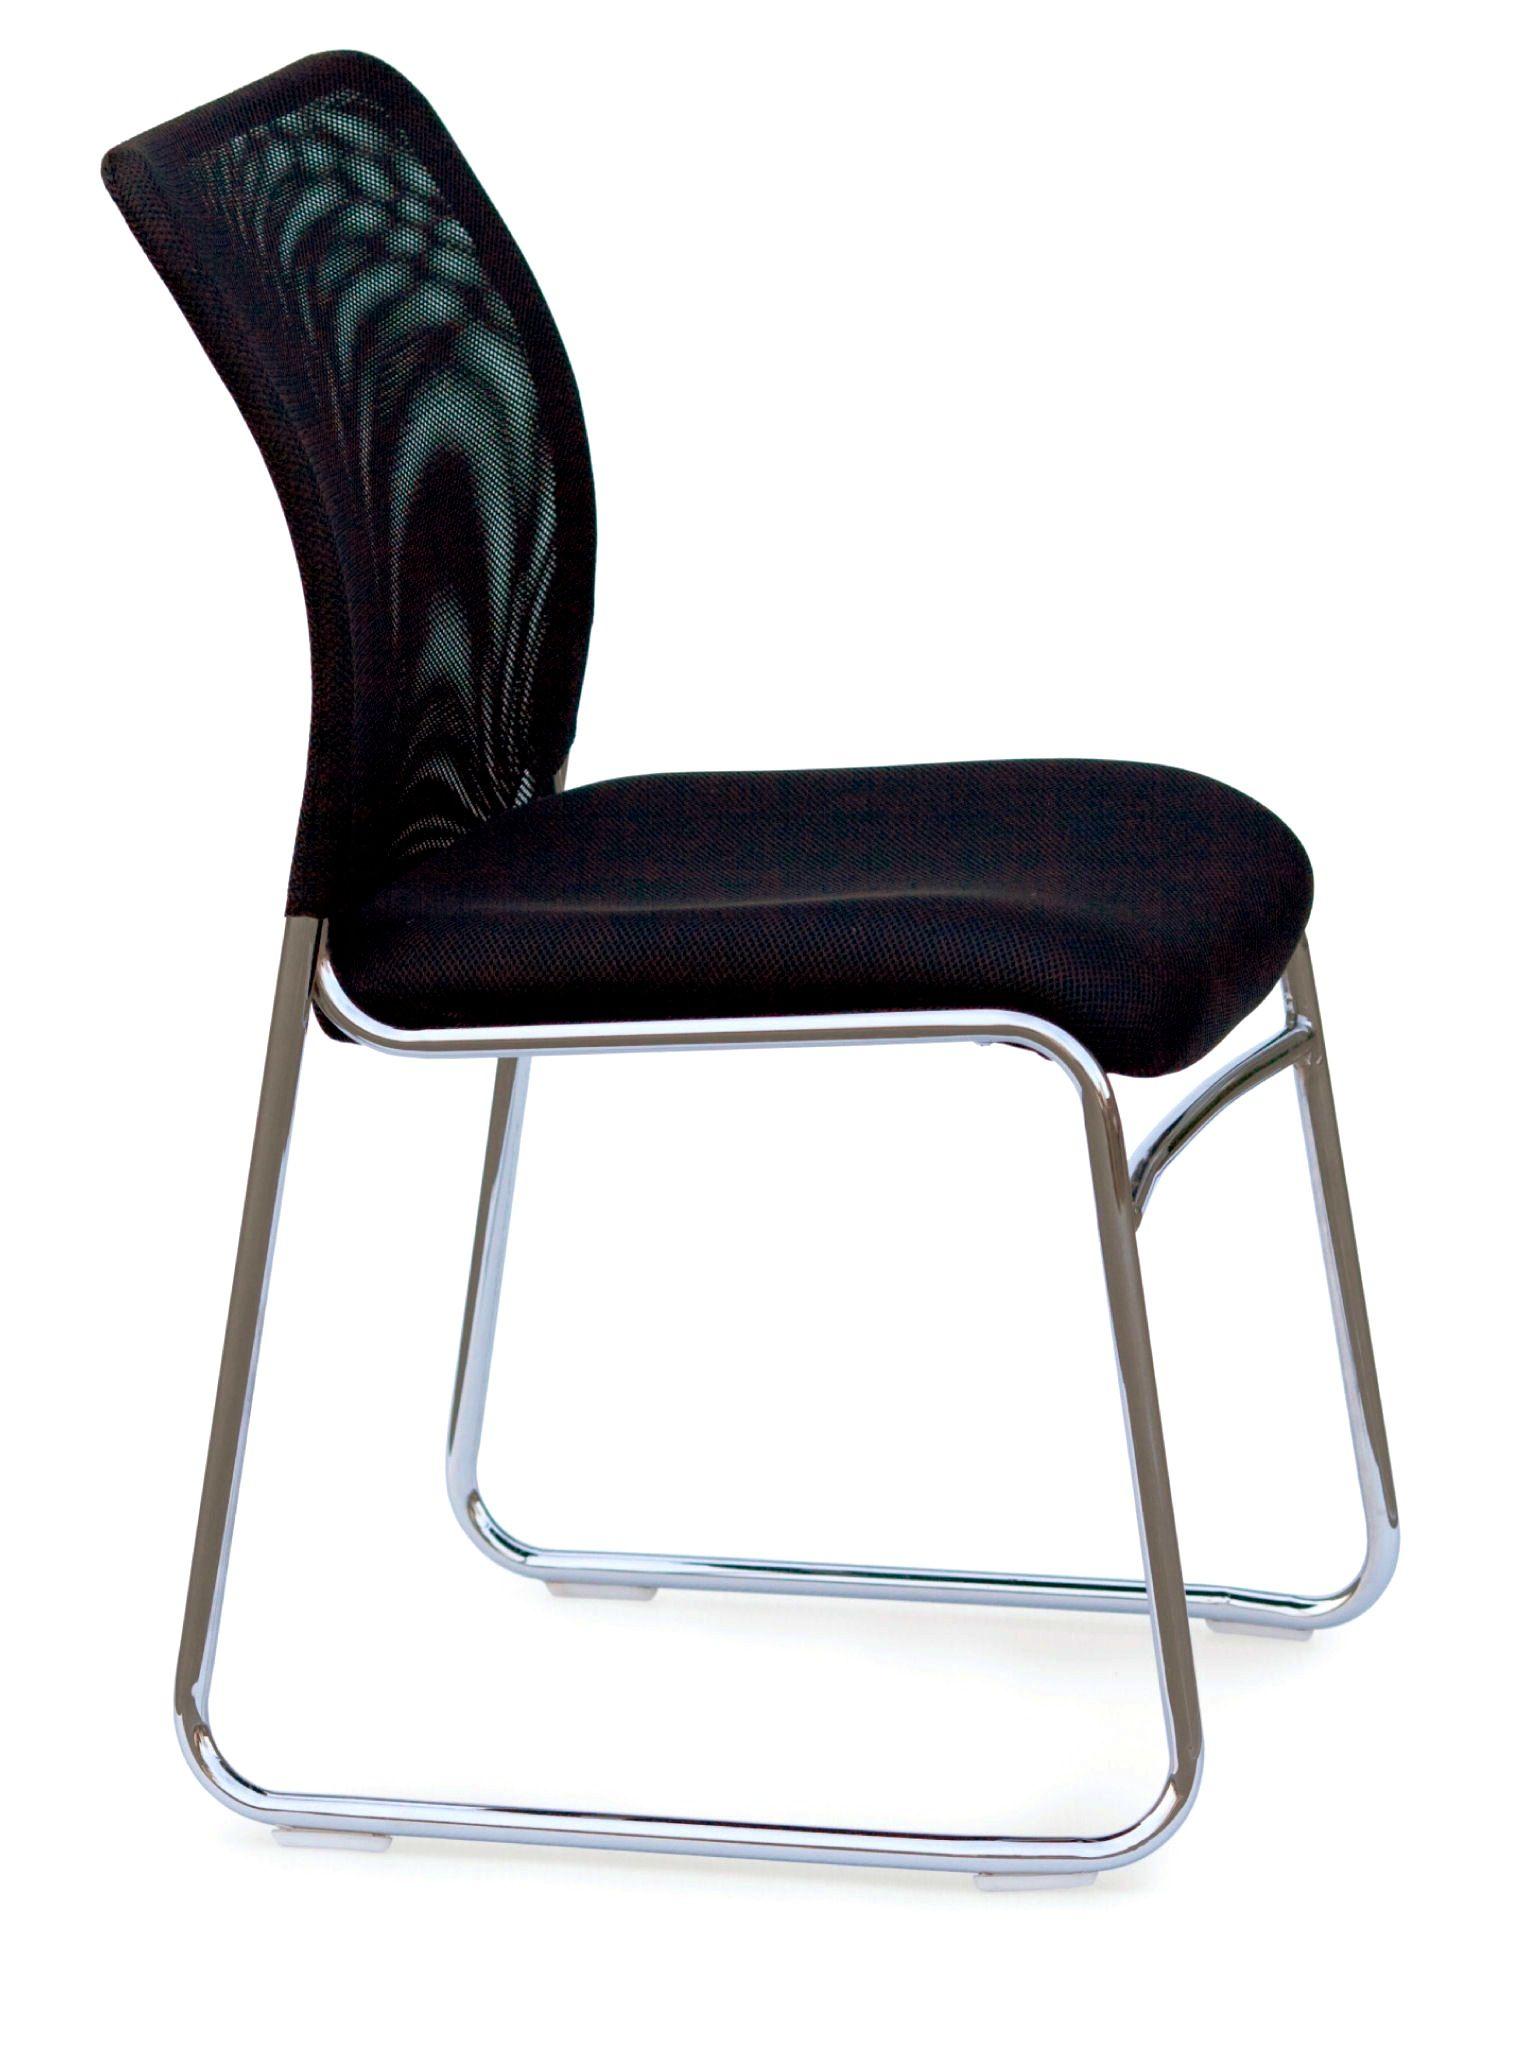 Bürostühle ohne Rollen Schreibtischstuhl, Bürostuhl